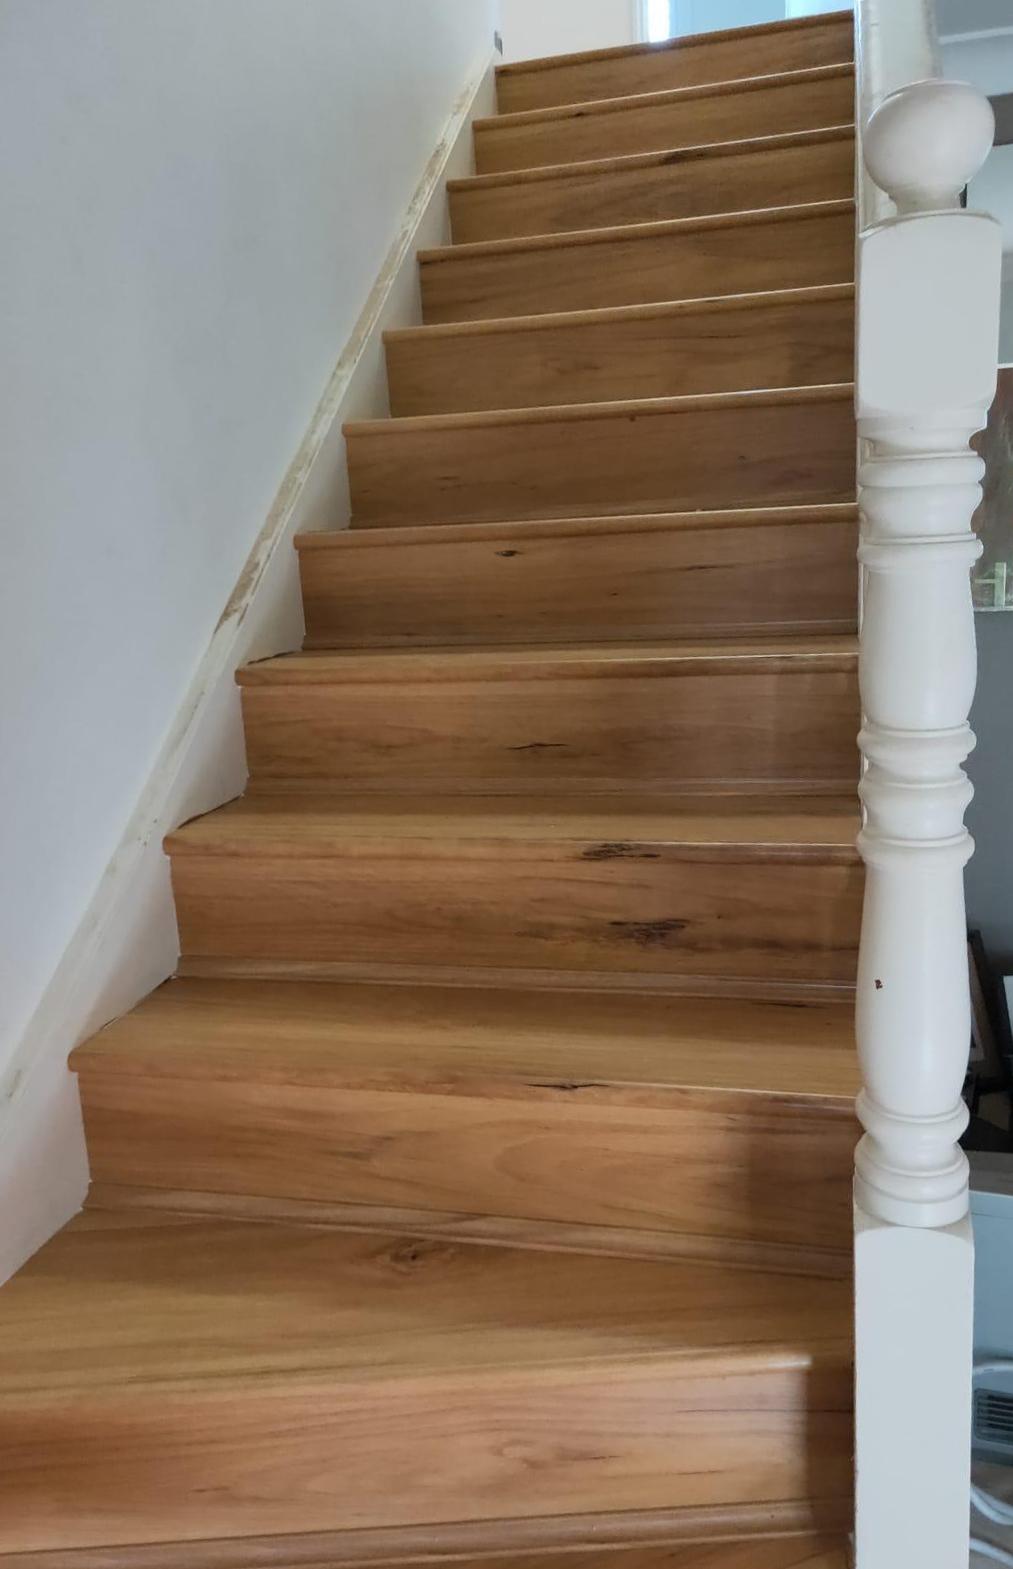 Blackbutt 8016-11 - Tanoa Flooring 12mm Longboard Laminate | Advanced Flooring Services